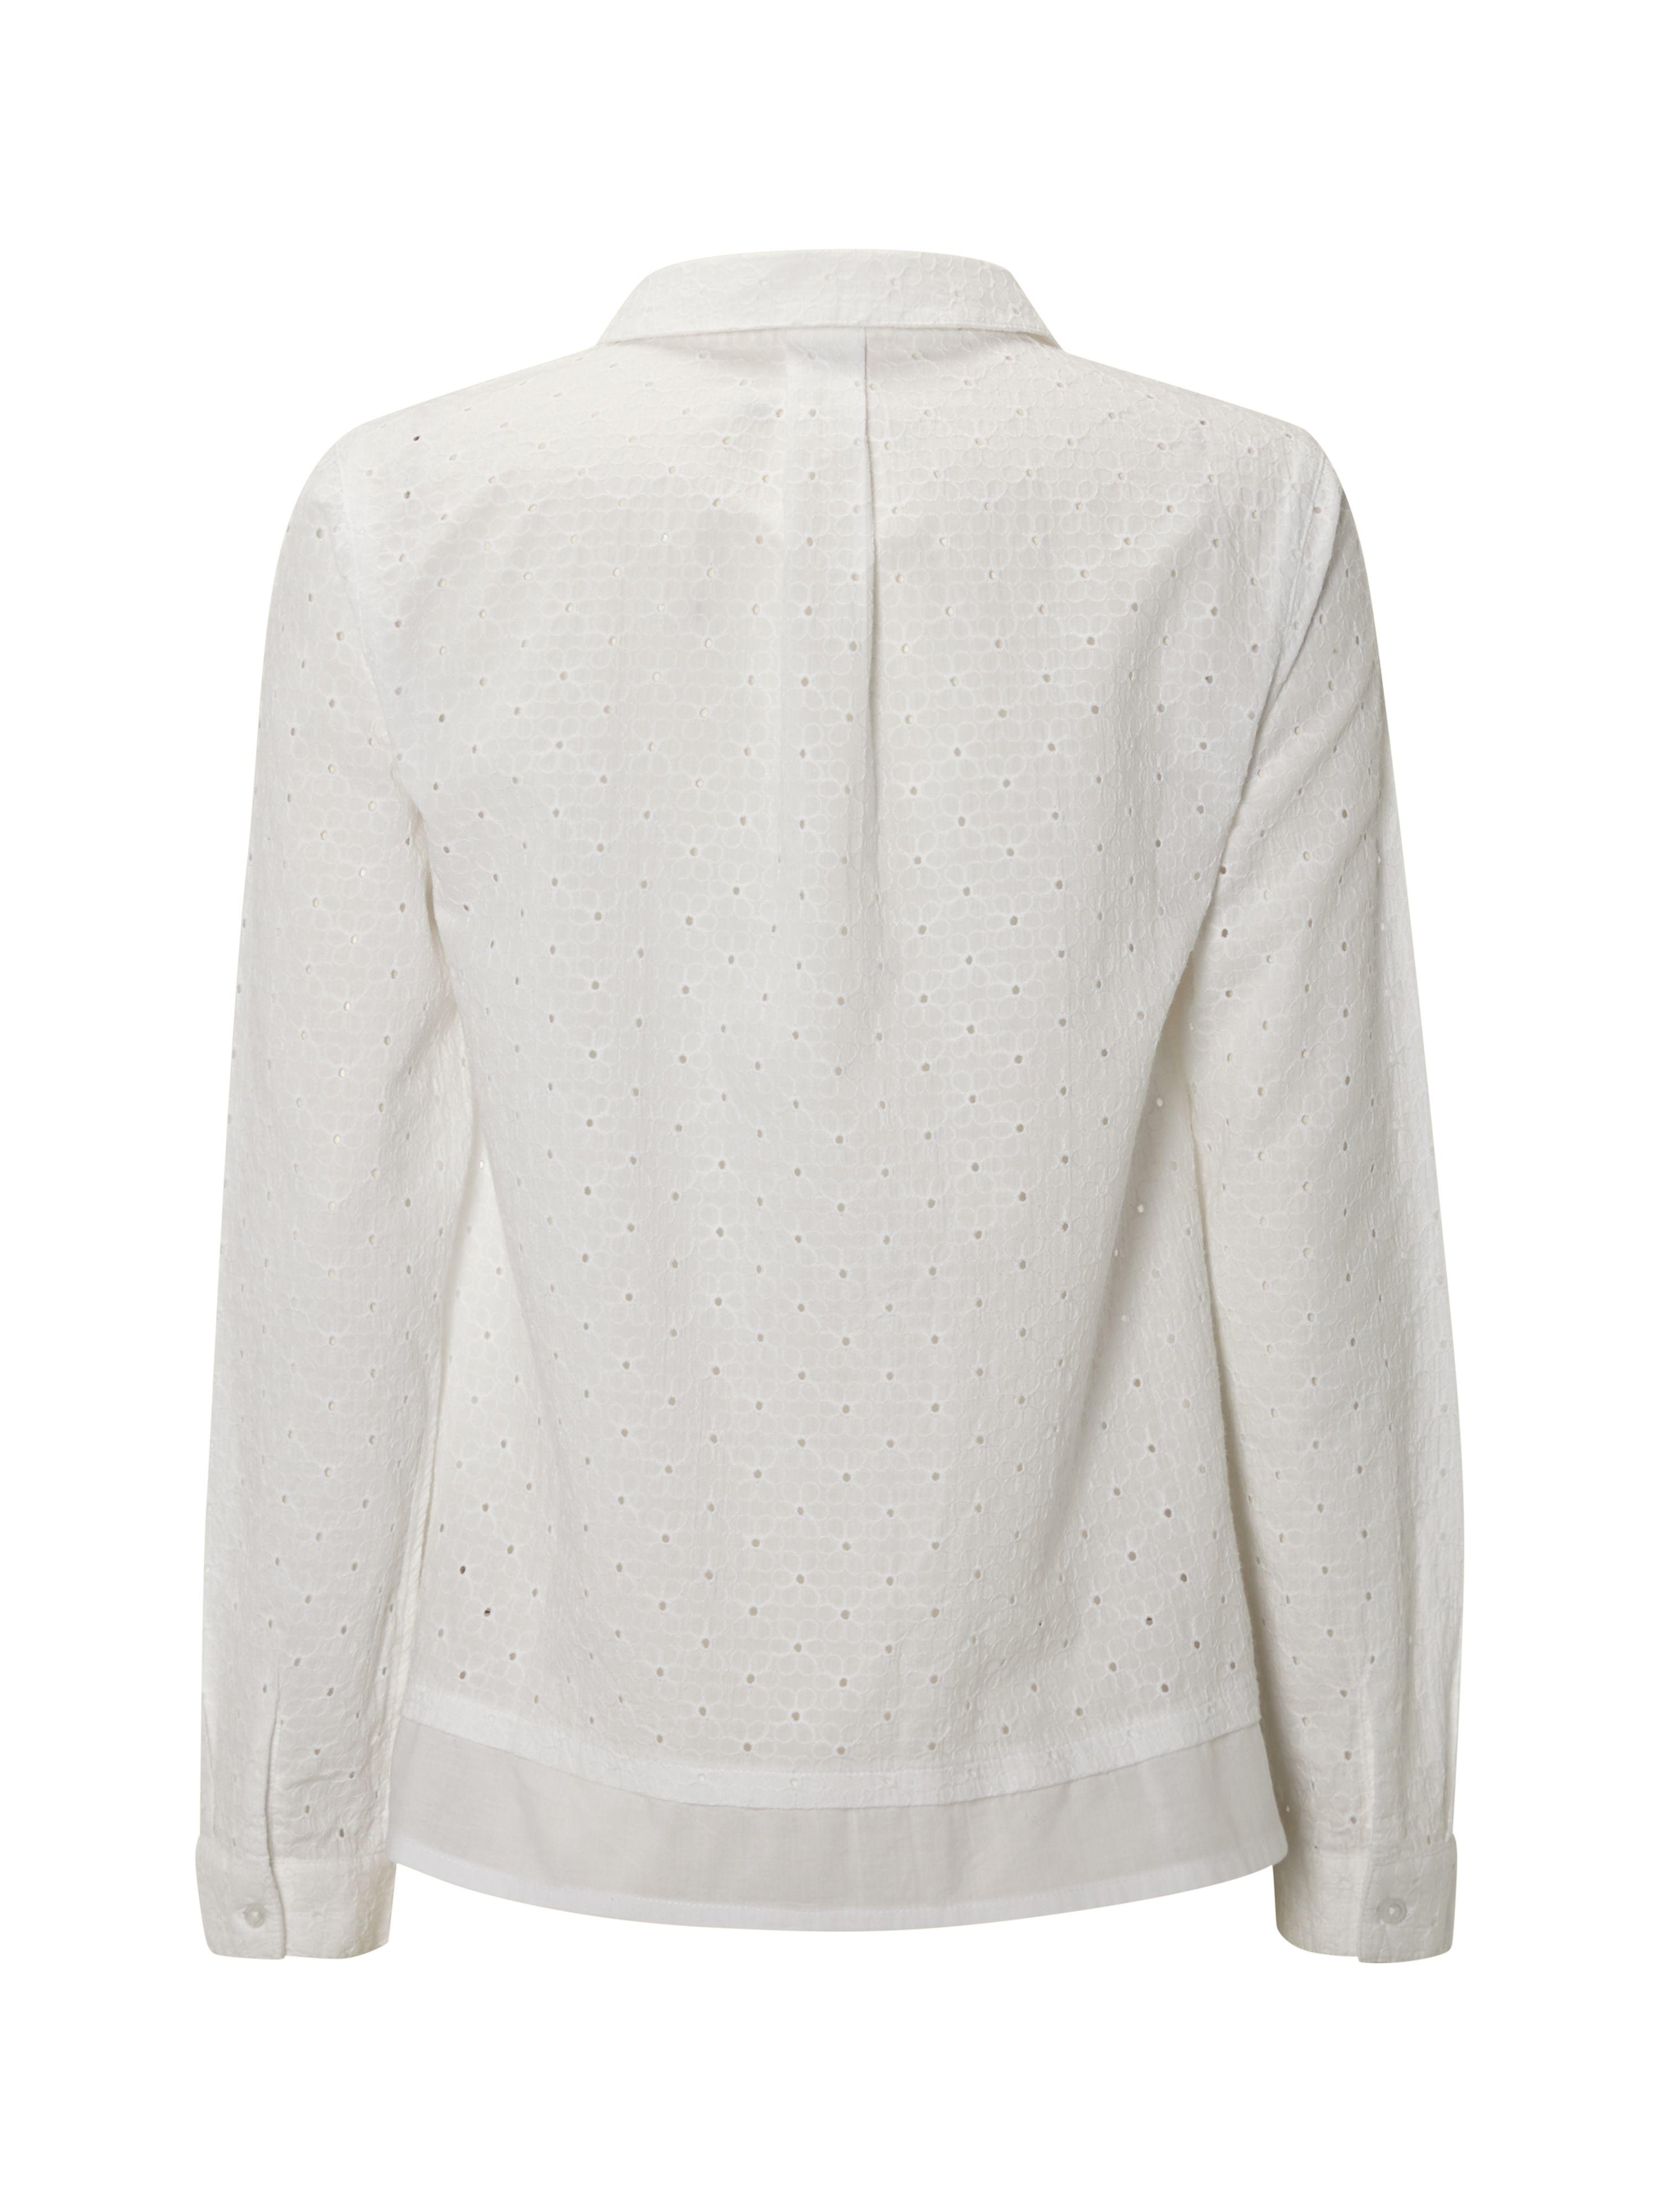 white stuff broderie shirt in white lyst